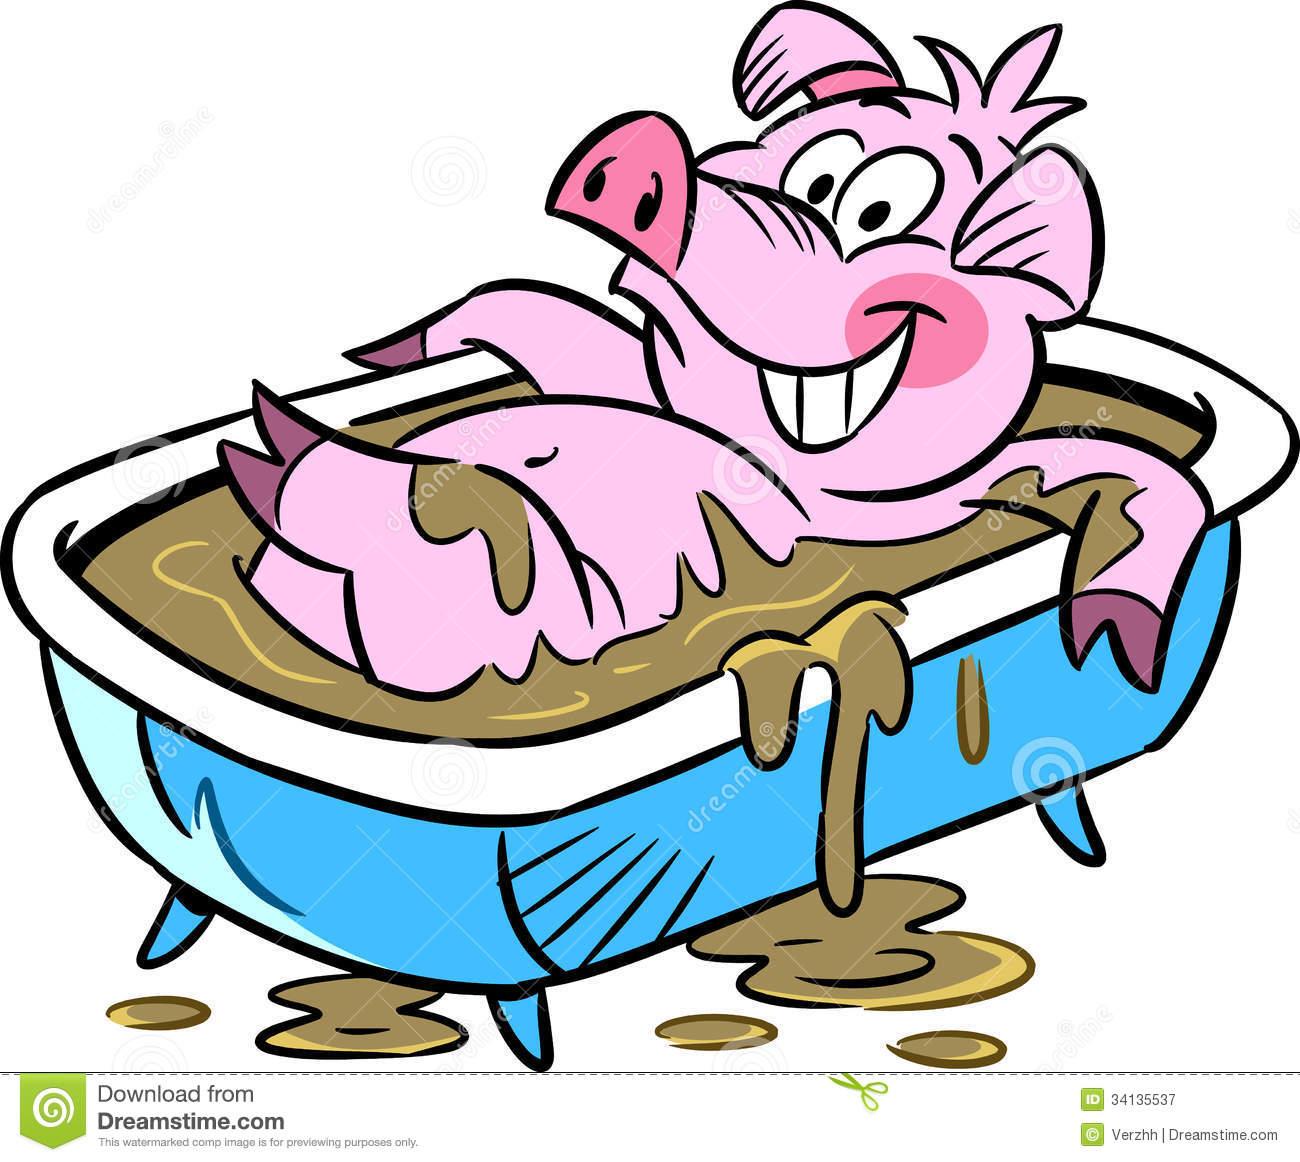 Pig clipart muddy pig In cartoon pig Clipart Mean